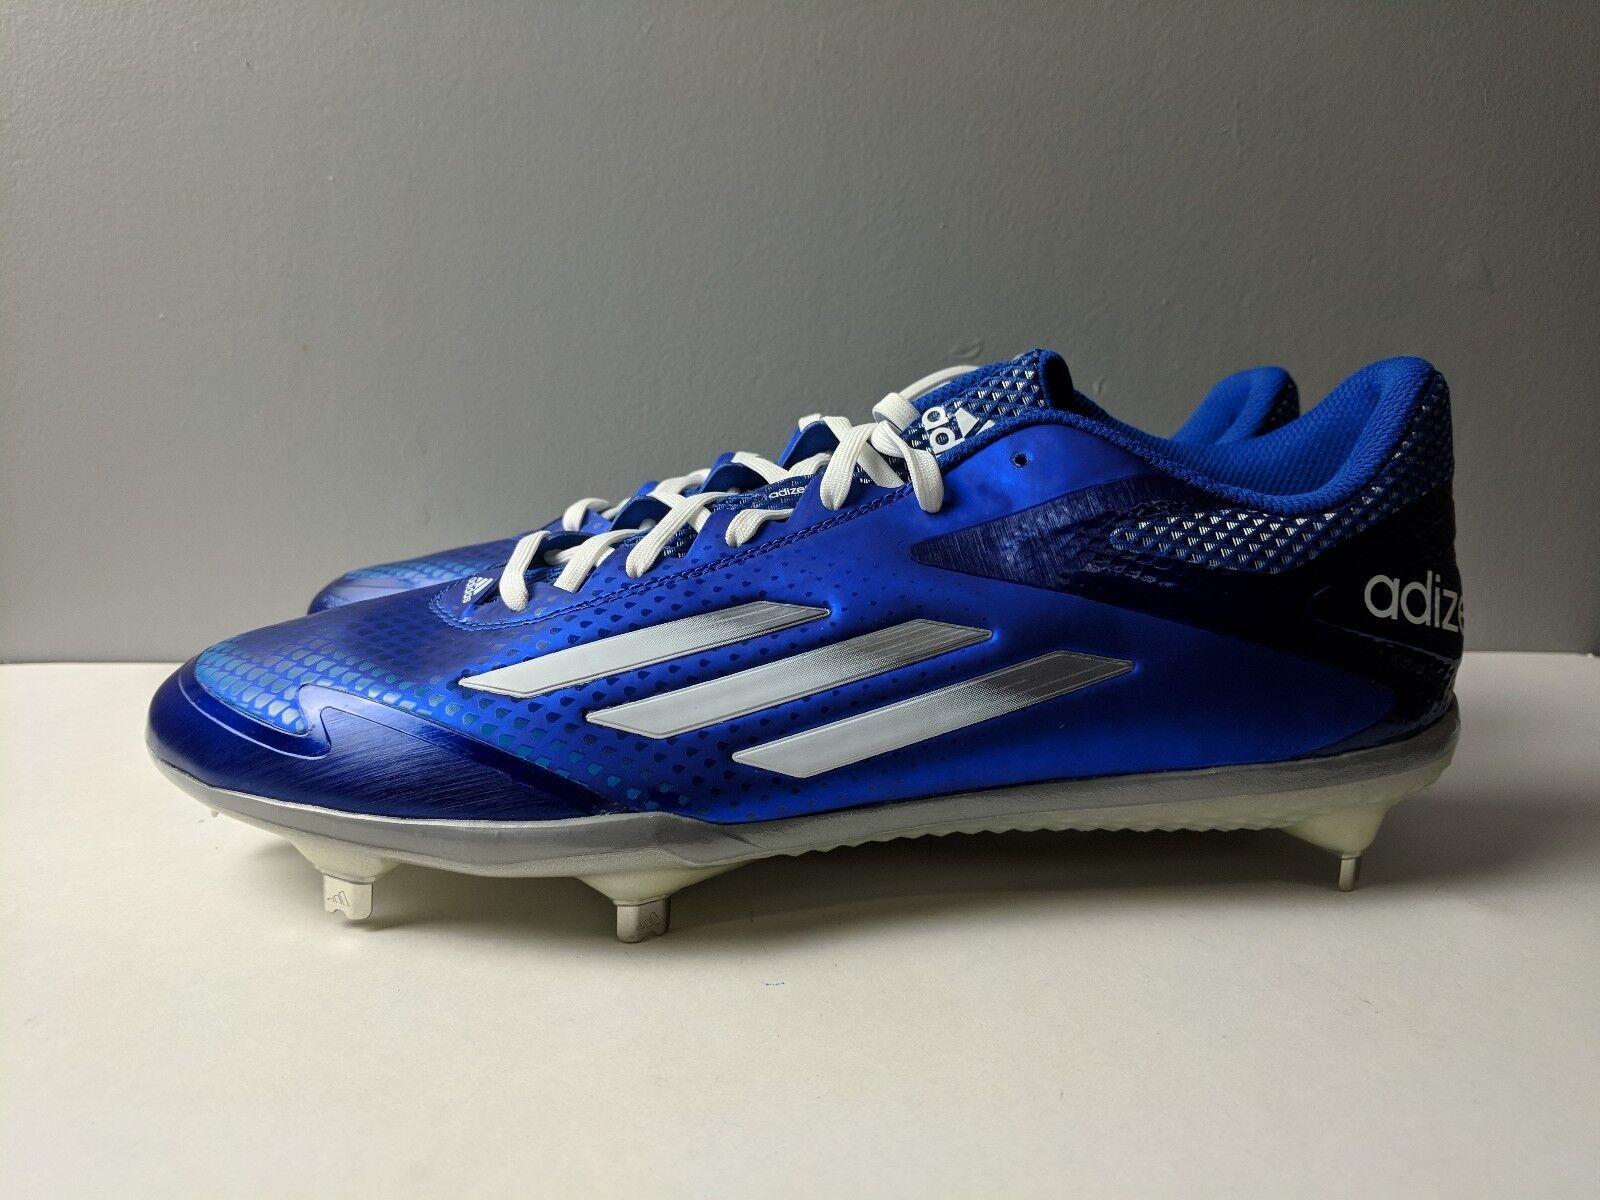 Adidas Baseball Adizero Afterburner 2.0 Men Baseball Adidas Cleat Royal Blue Brand New Size 12.5 fa09f0